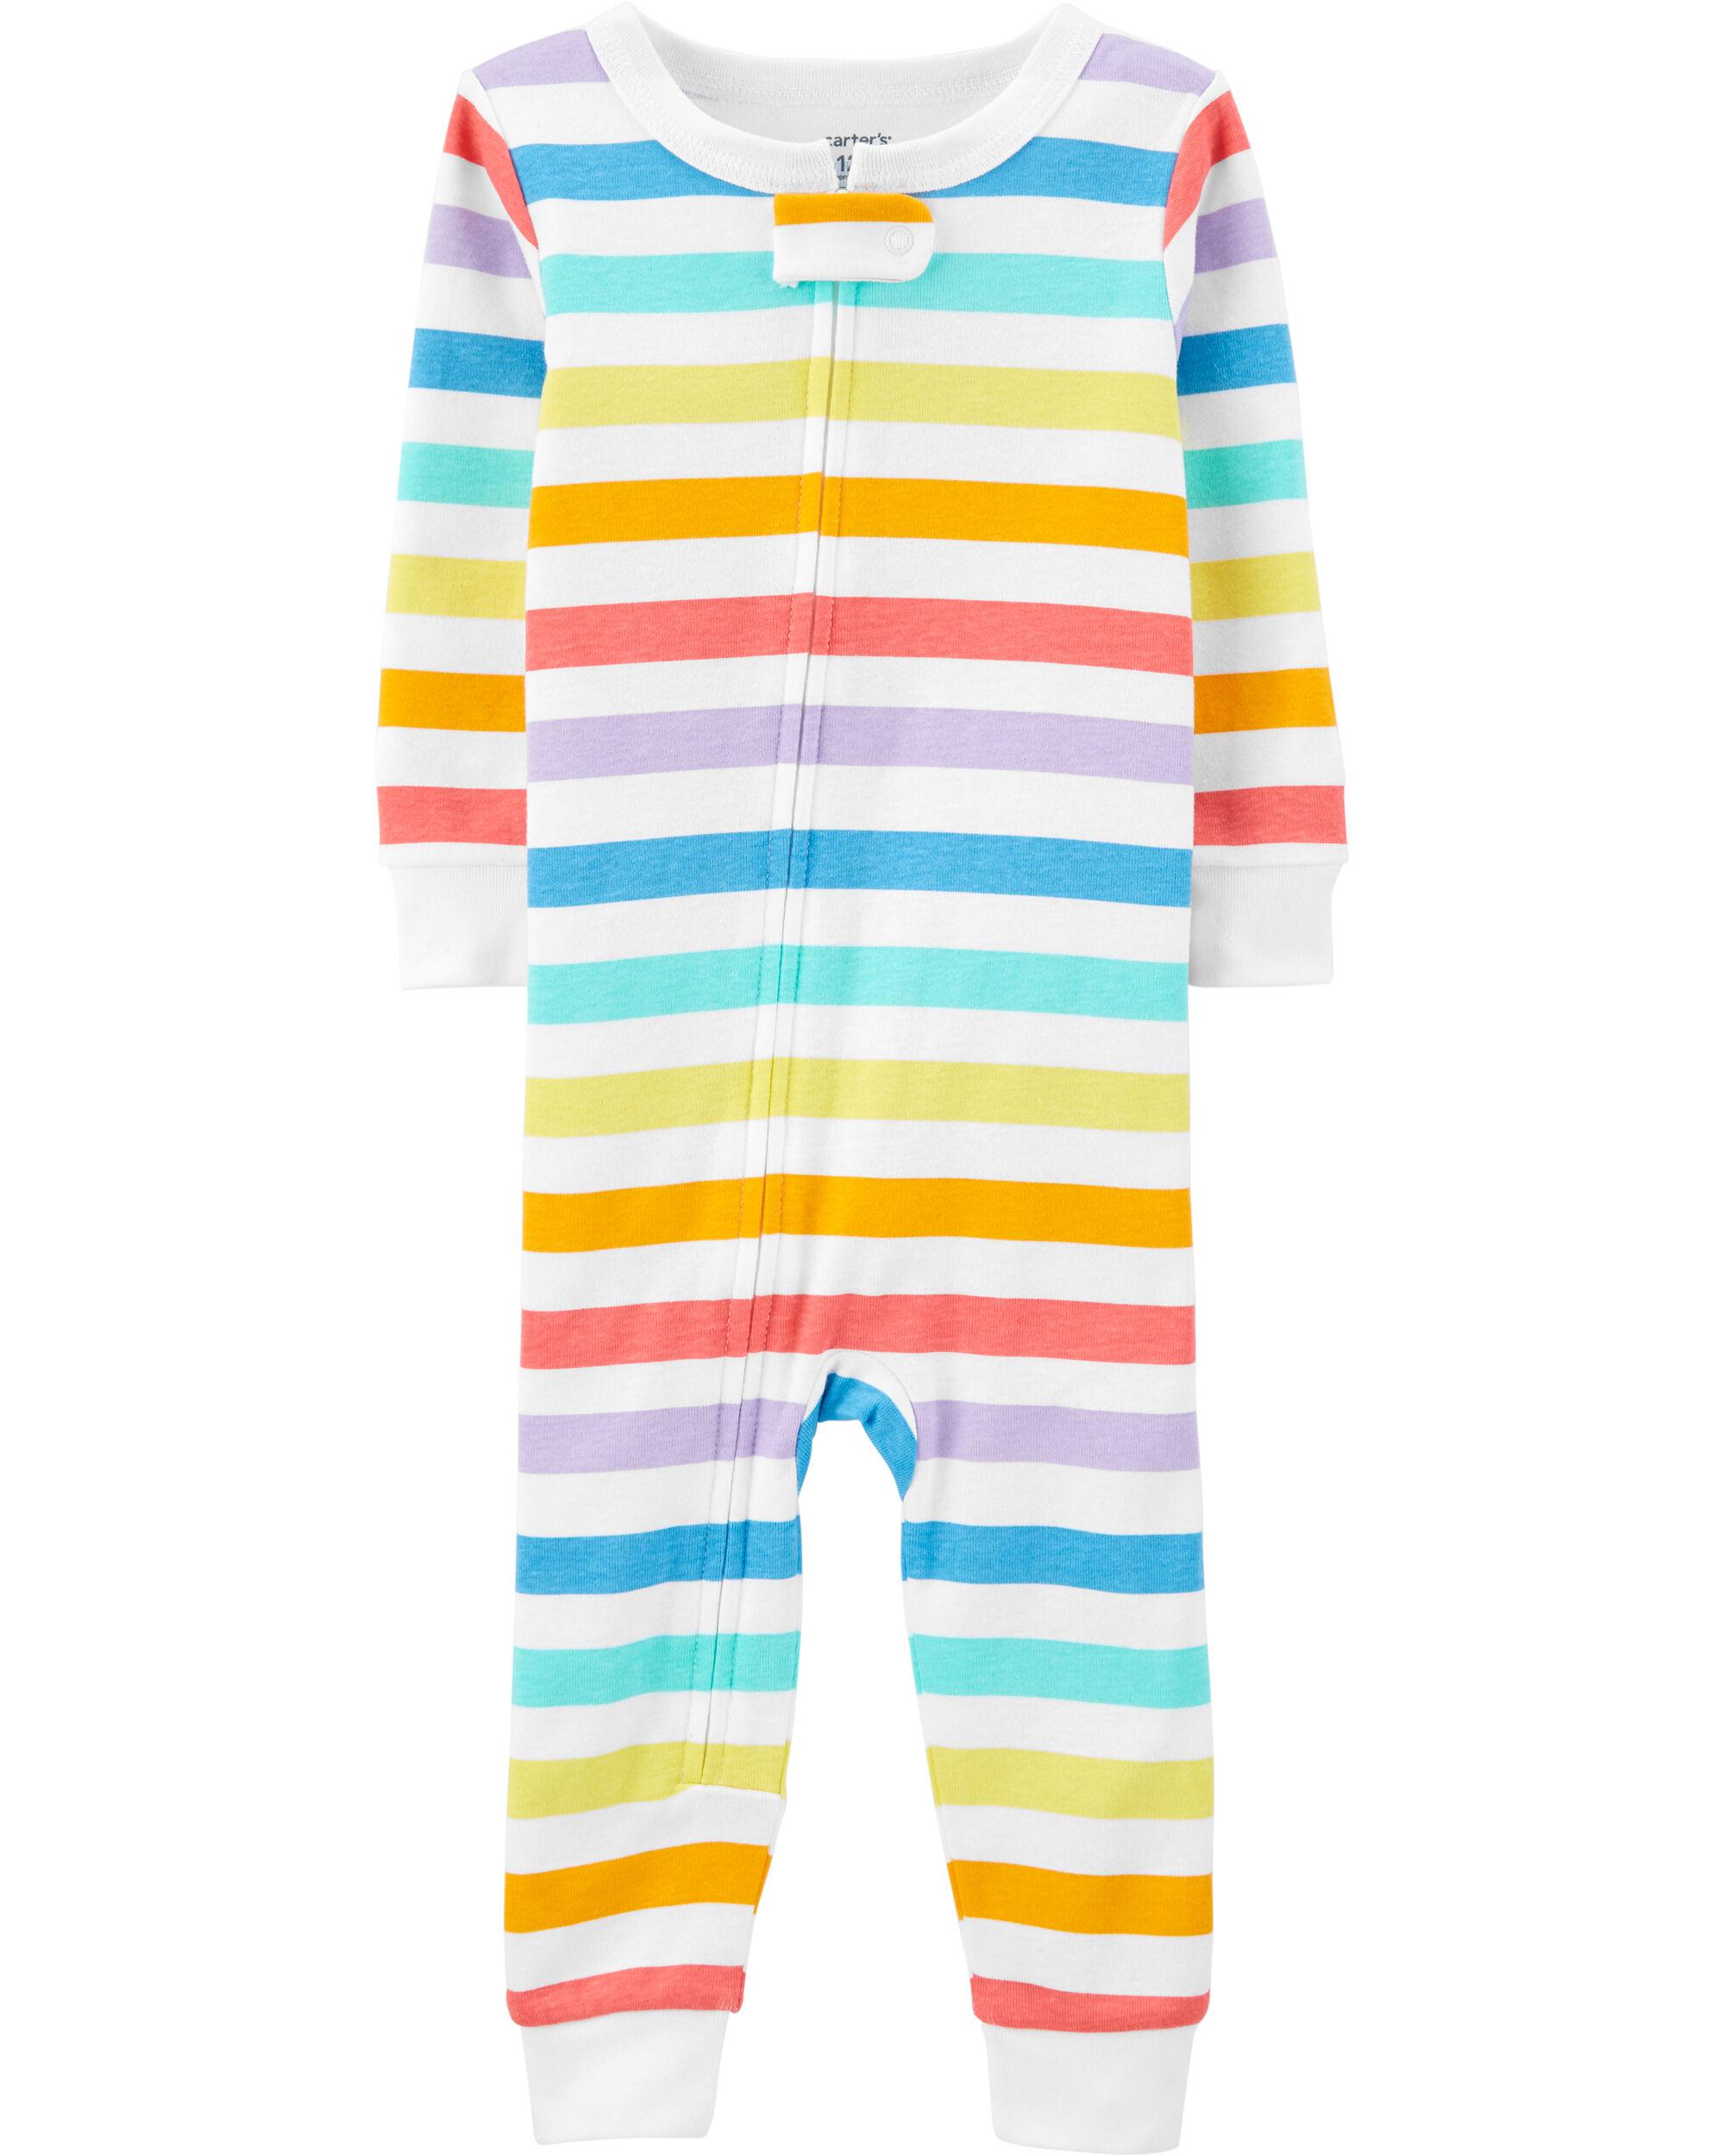 Girls Boys Baby Character Kids Pyjamas Pyjama Set Nightwear 6 Months-12 Years